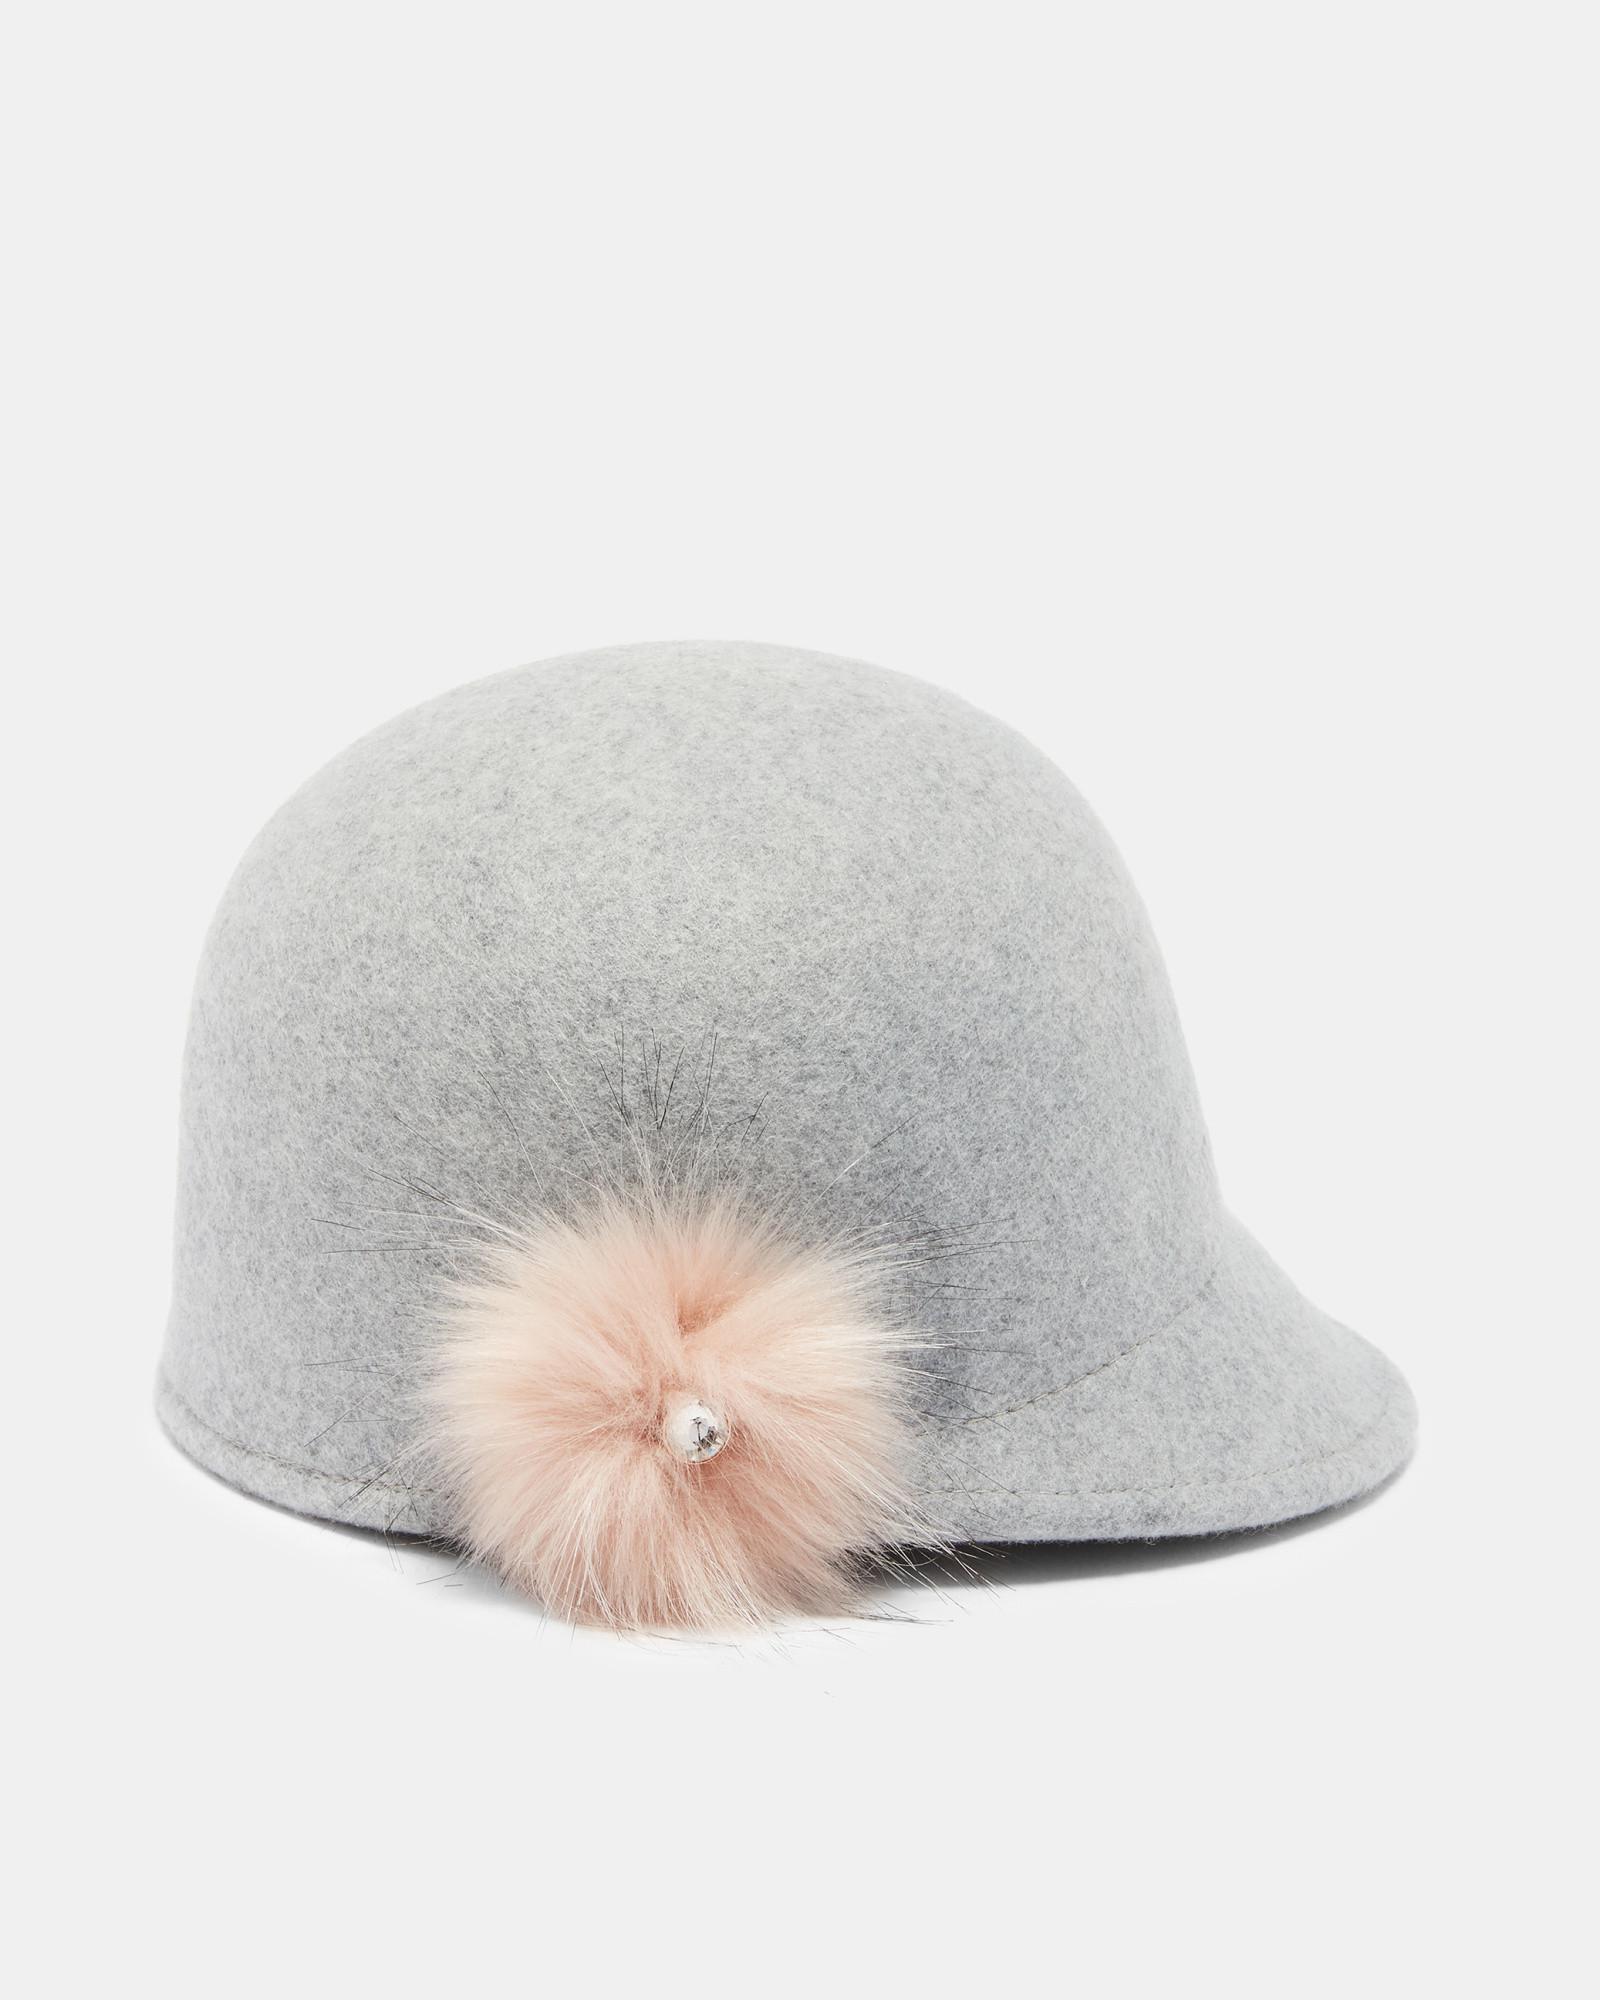 67389a1bd6dc6 Lyst - Ted Baker Faux Fur Pom-pom Hat in Gray